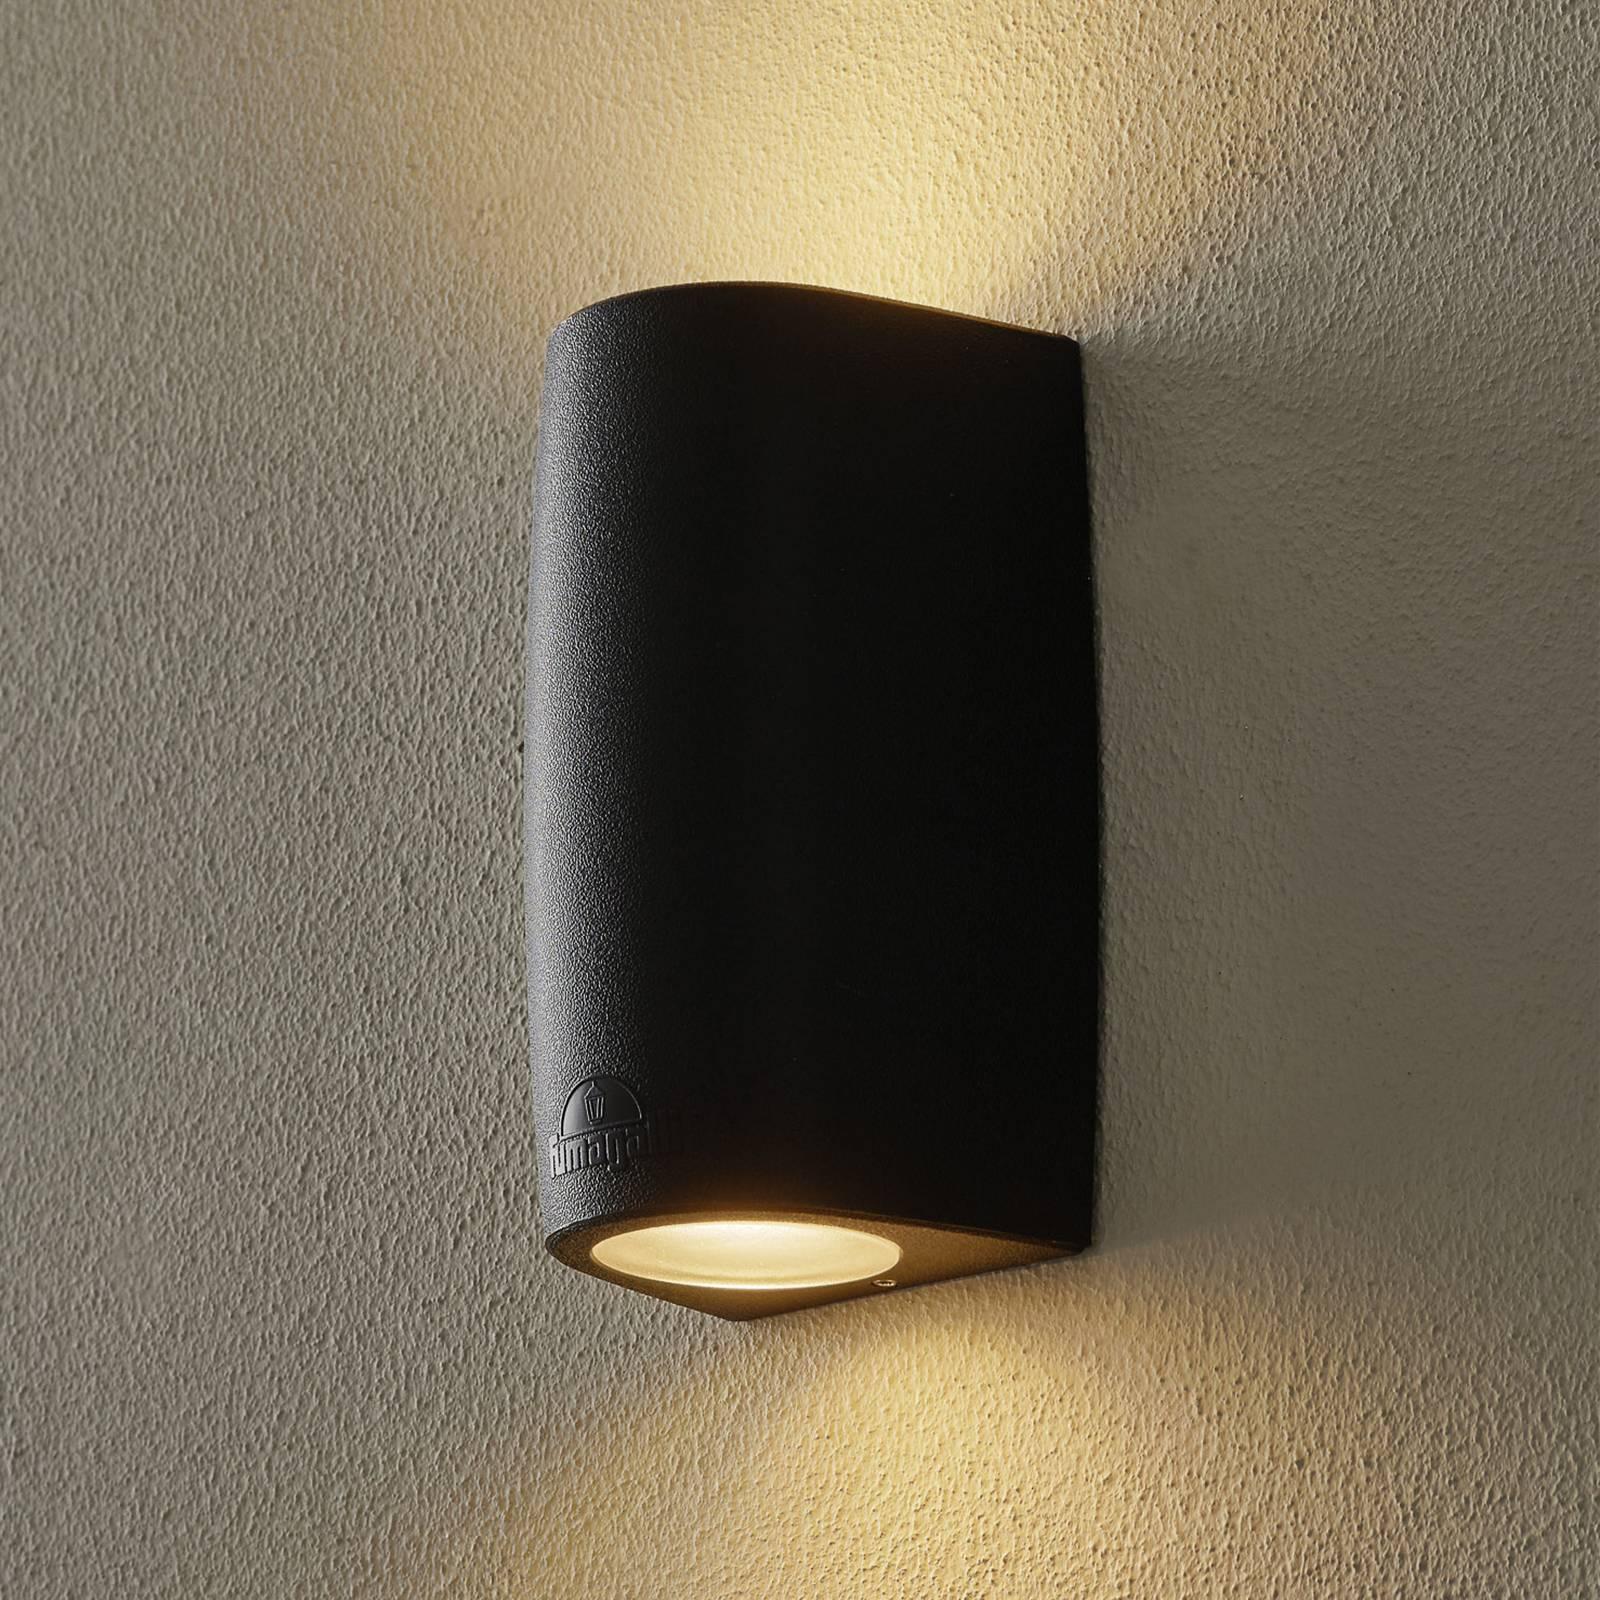 Marta-seinälamppu 9,2 cm 2-lamp. CCT musta/frosted